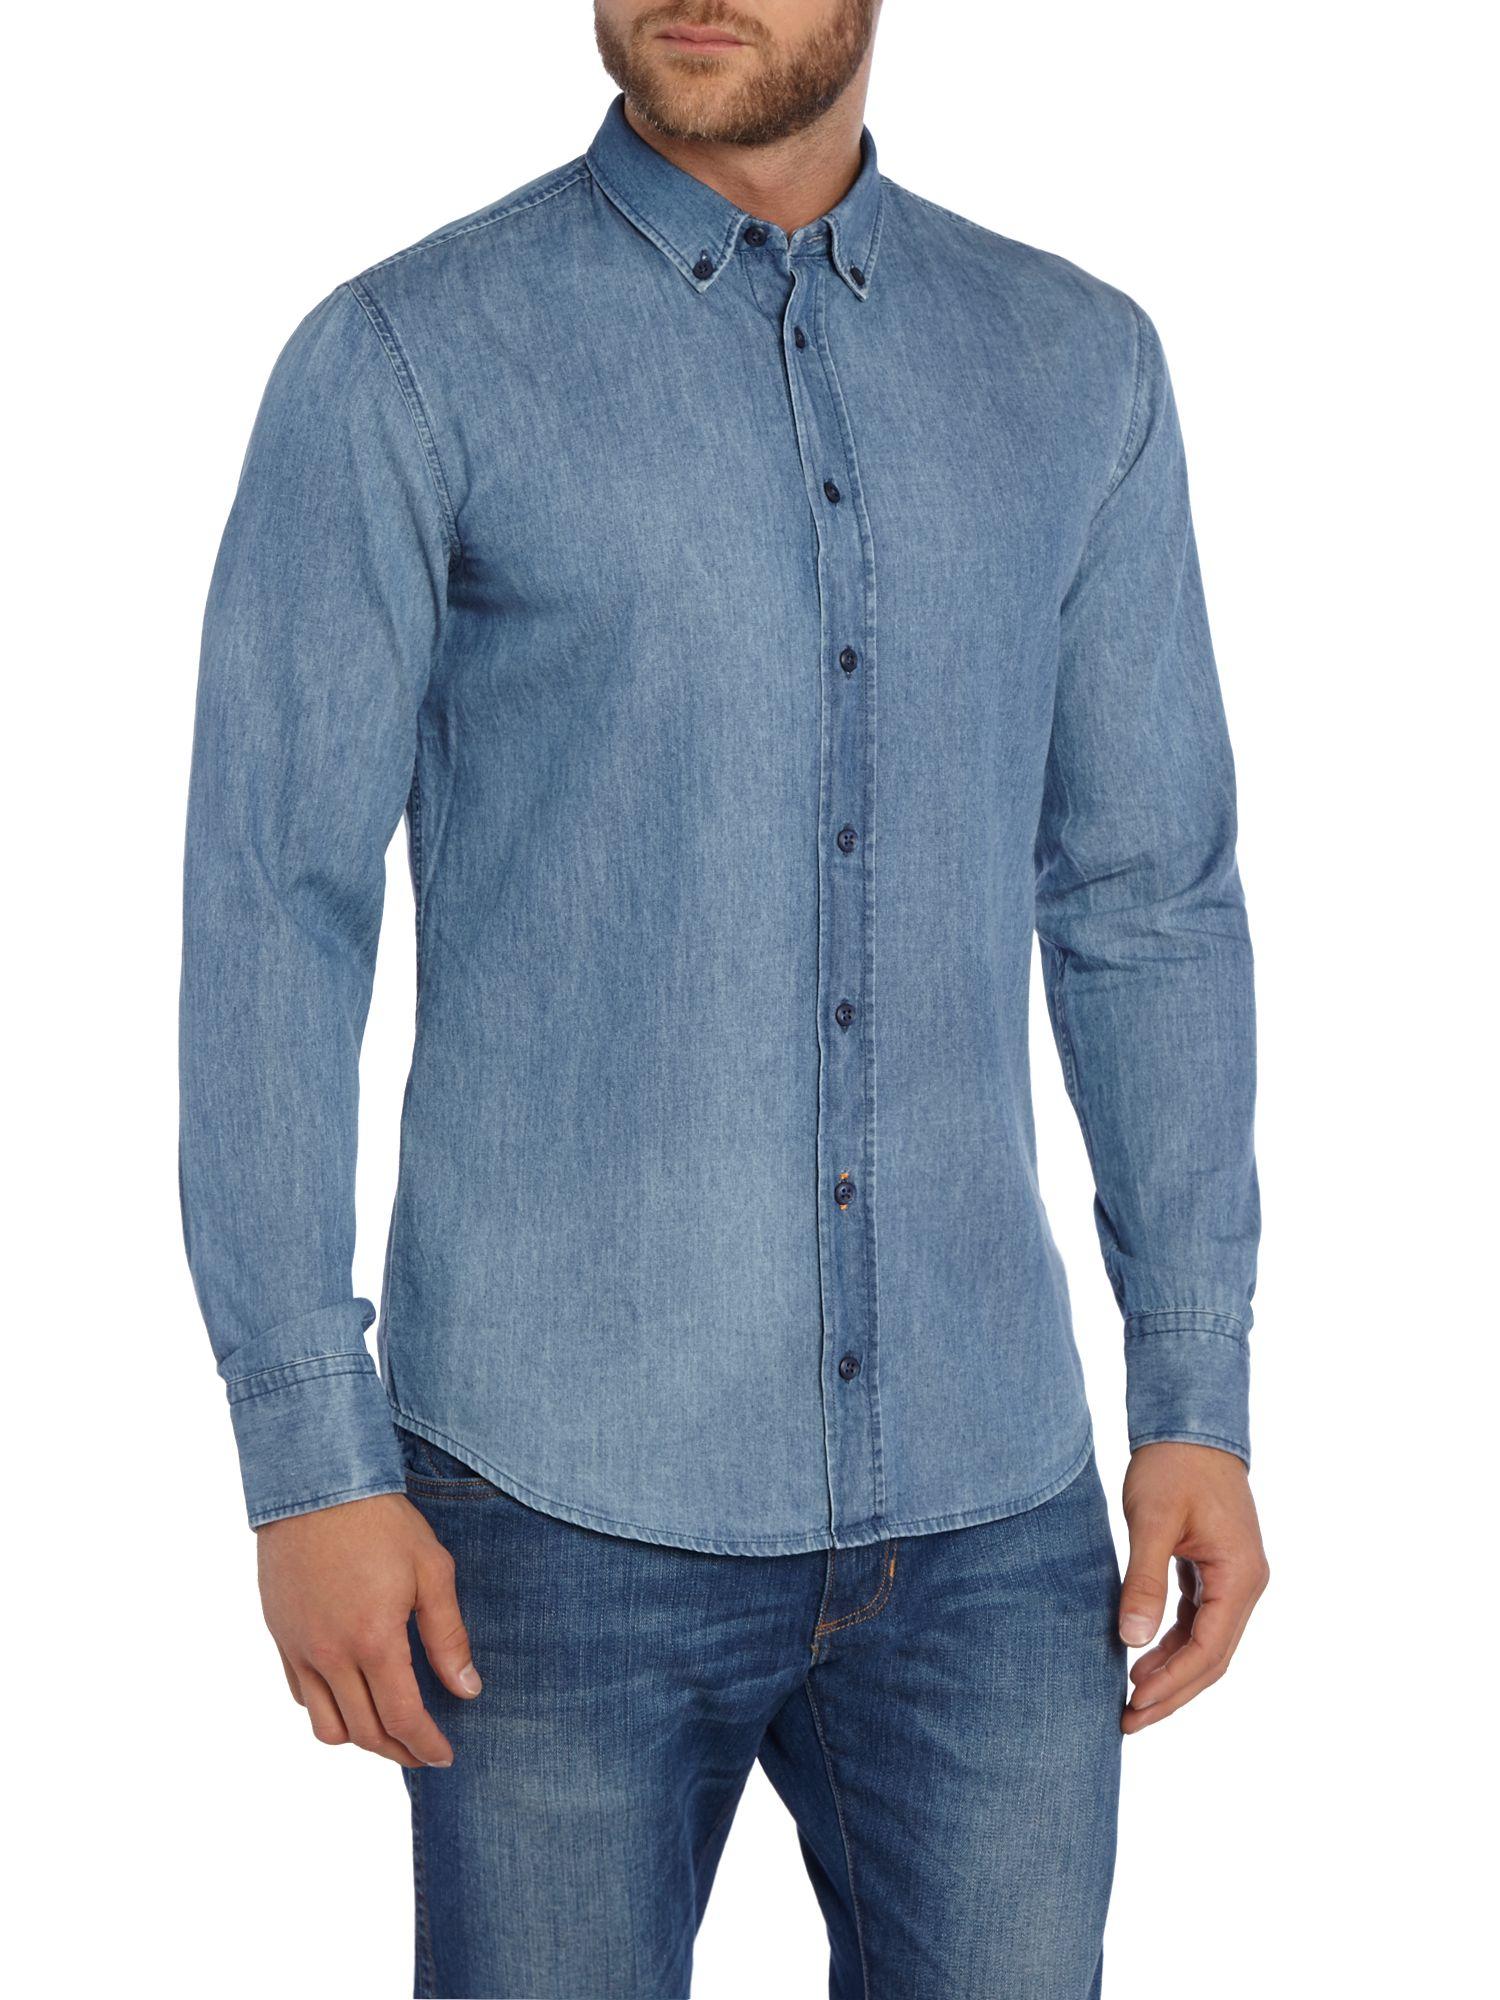 Boss Edipoe Slim Fit Button Down Denim Shirt In Blue For